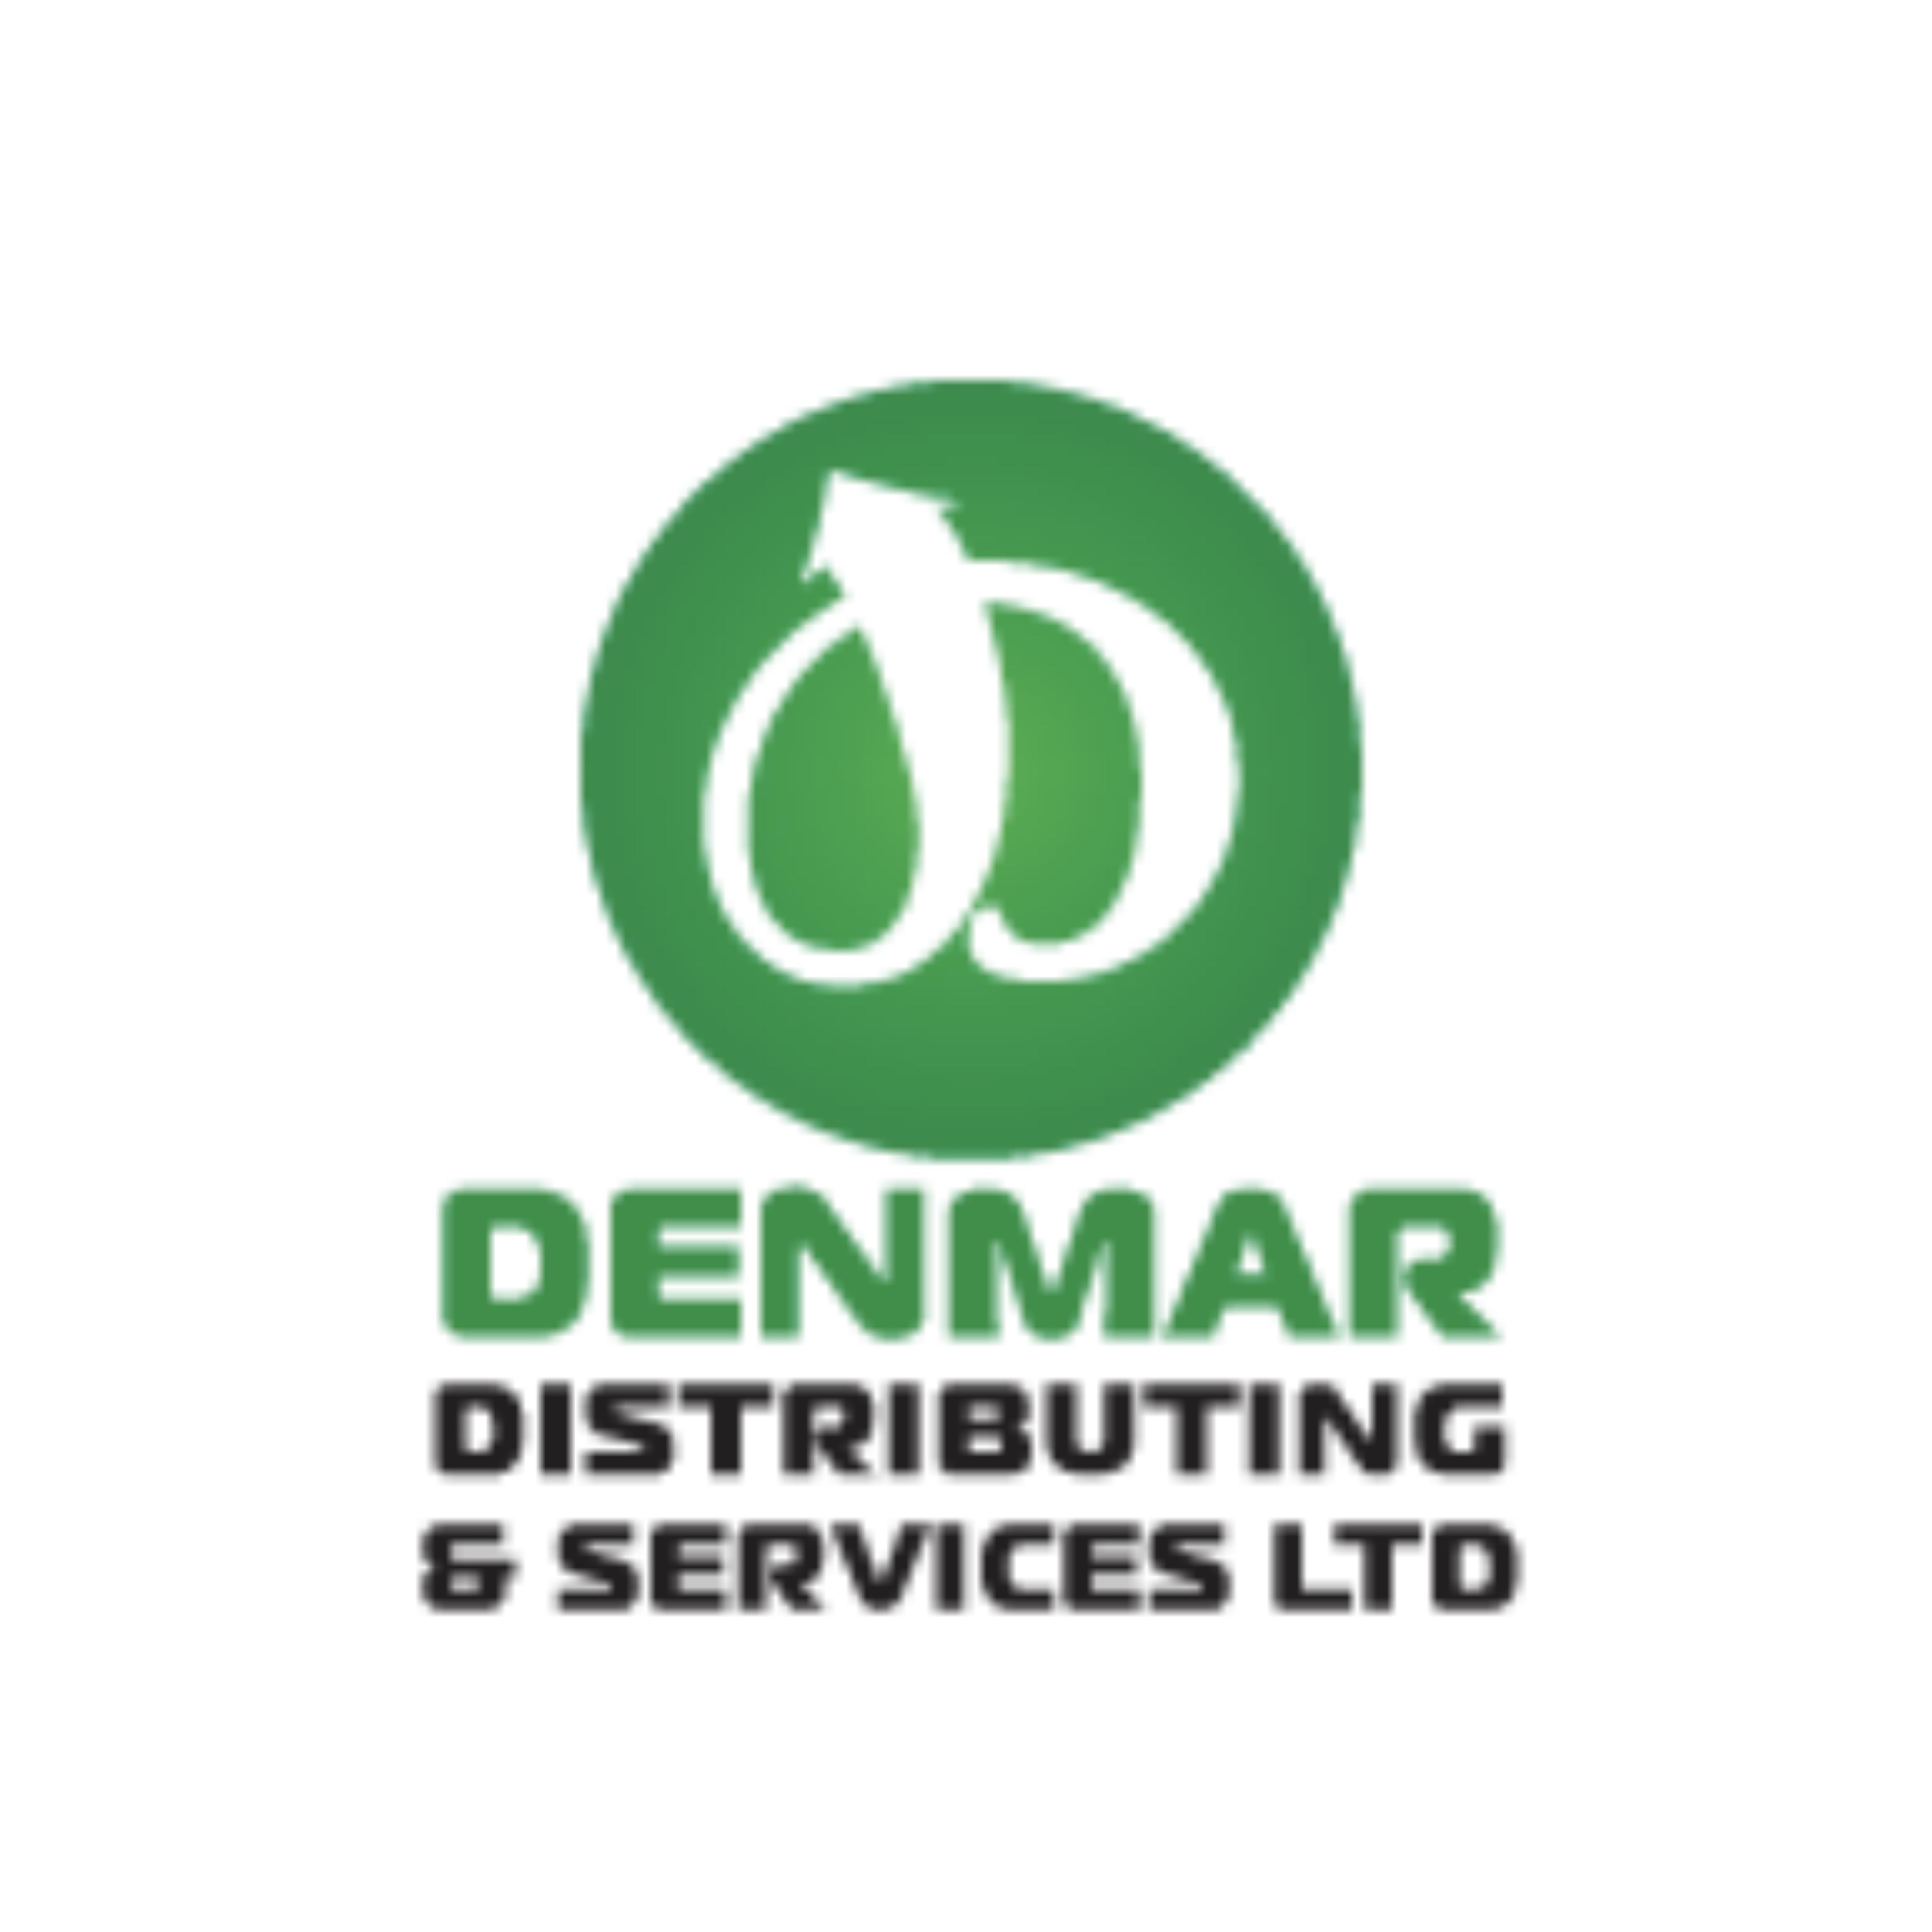 Denmar Distributing & Services